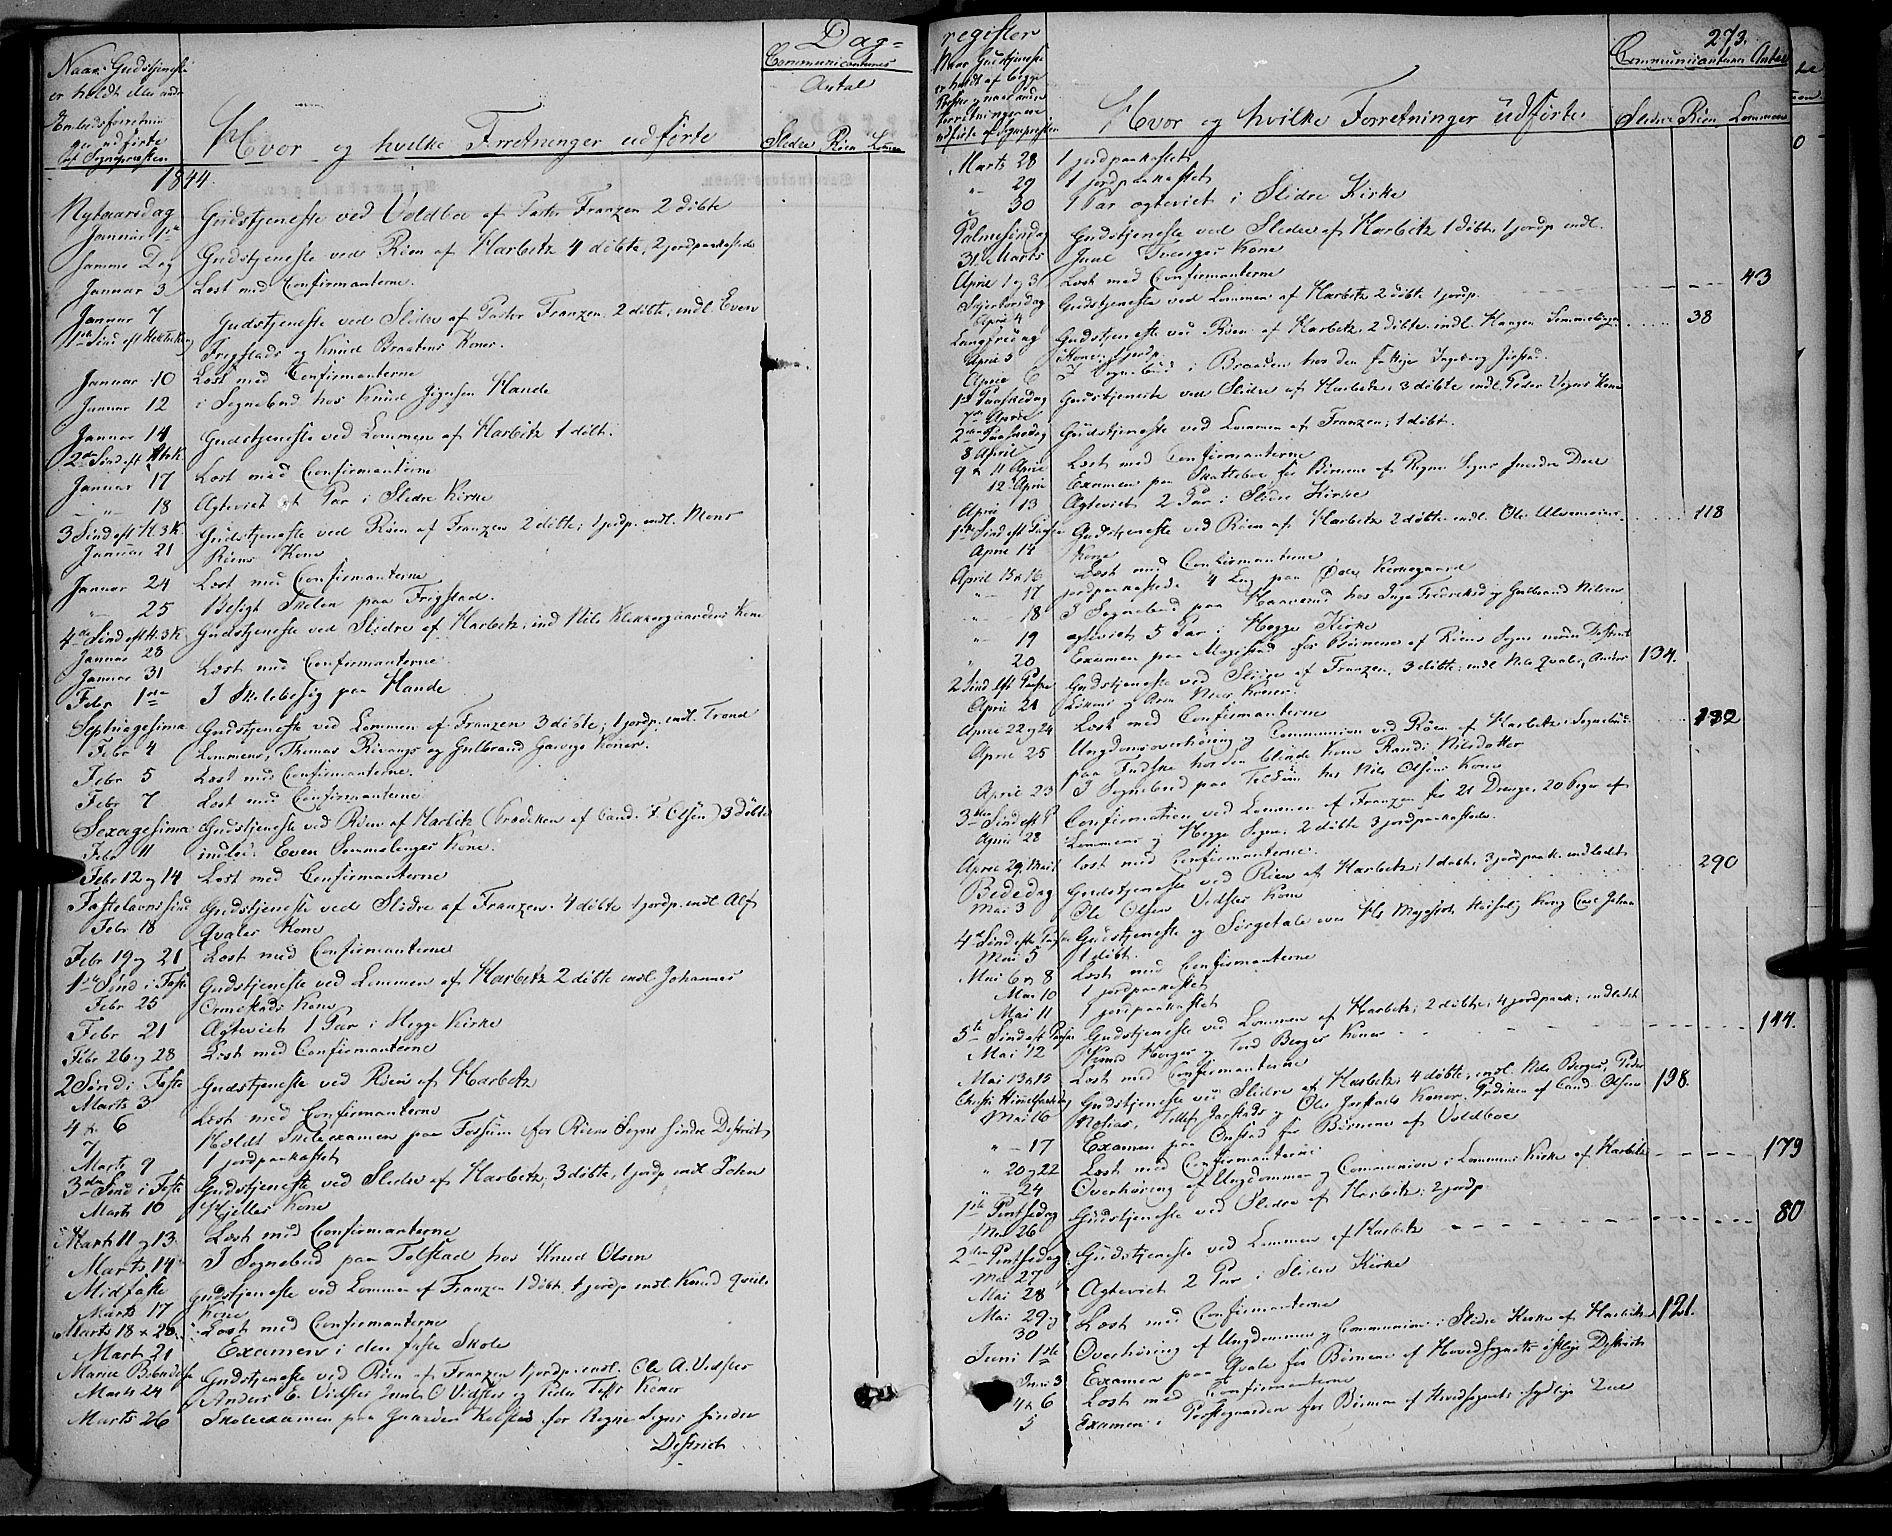 SAH, Vestre Slidre prestekontor, Ministerialbok nr. 1, 1844-1855, s. 273